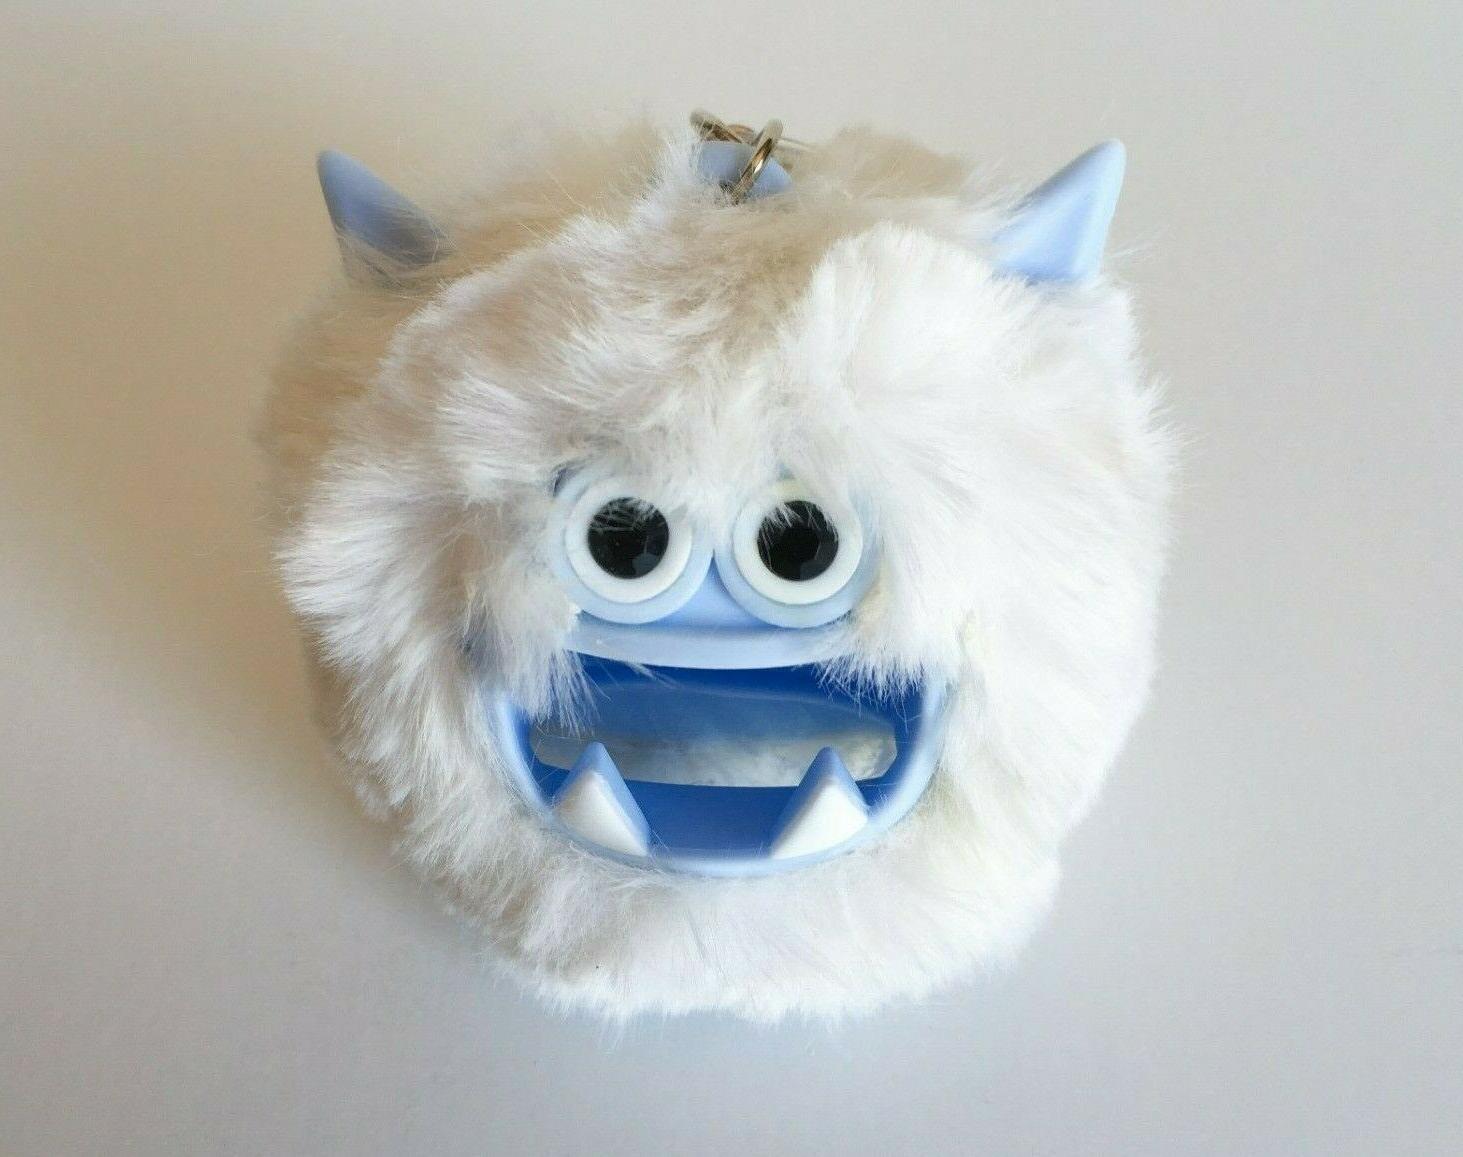 Bath YETI Fuzzy White Pocketbac Sanitizer Holder Sleeve